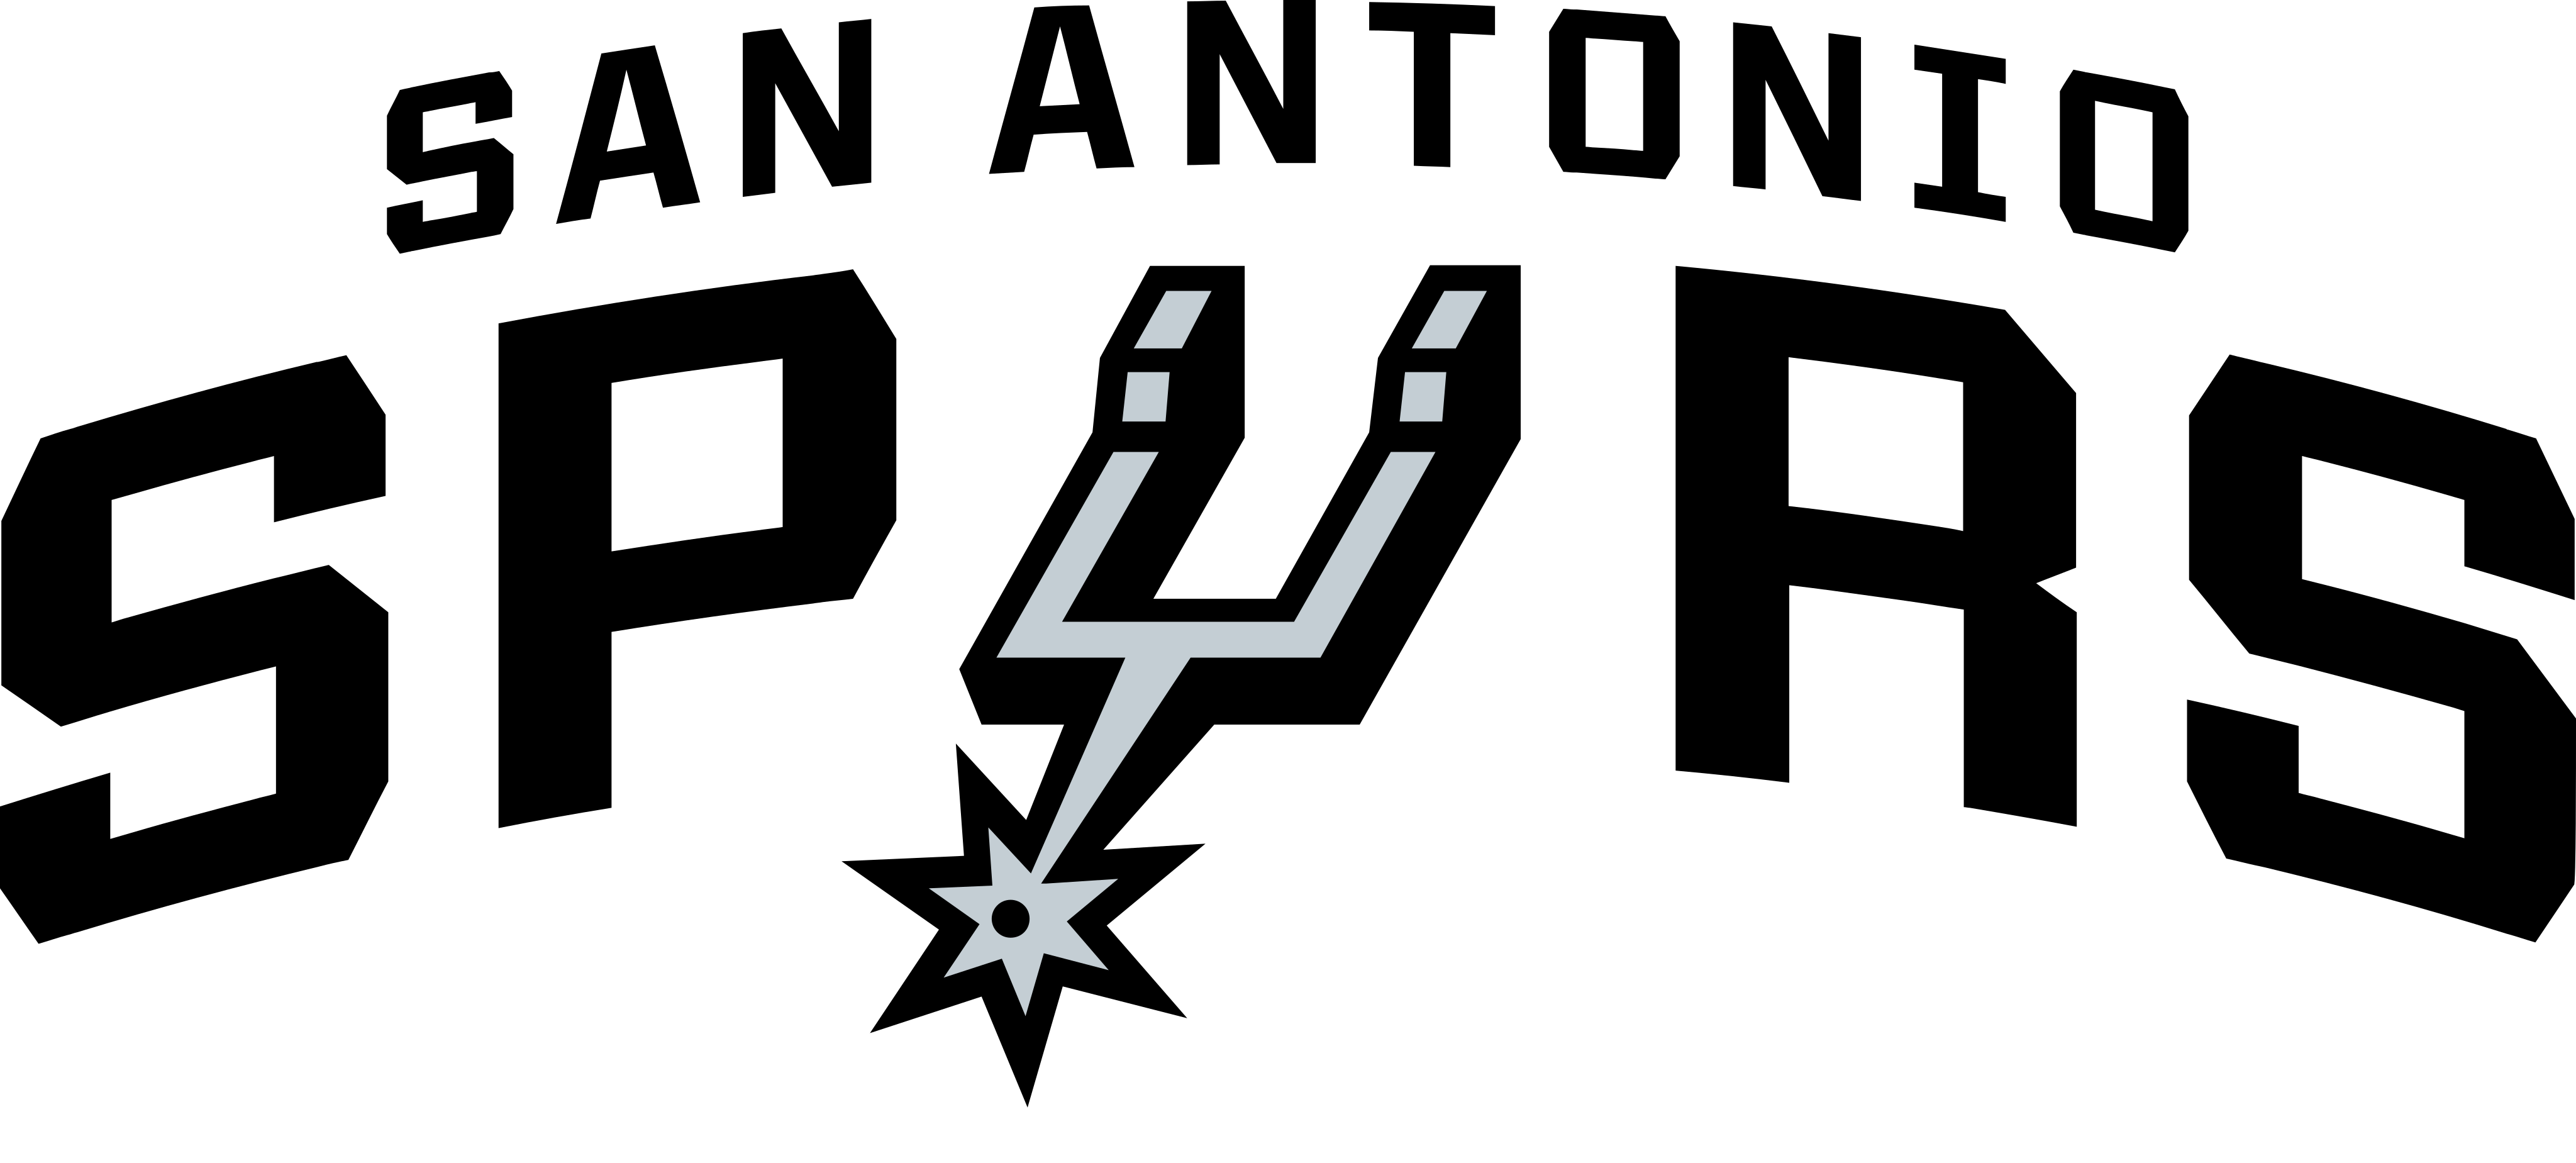 san antonio spurs logo 1 - San Antonio Spurs Logo